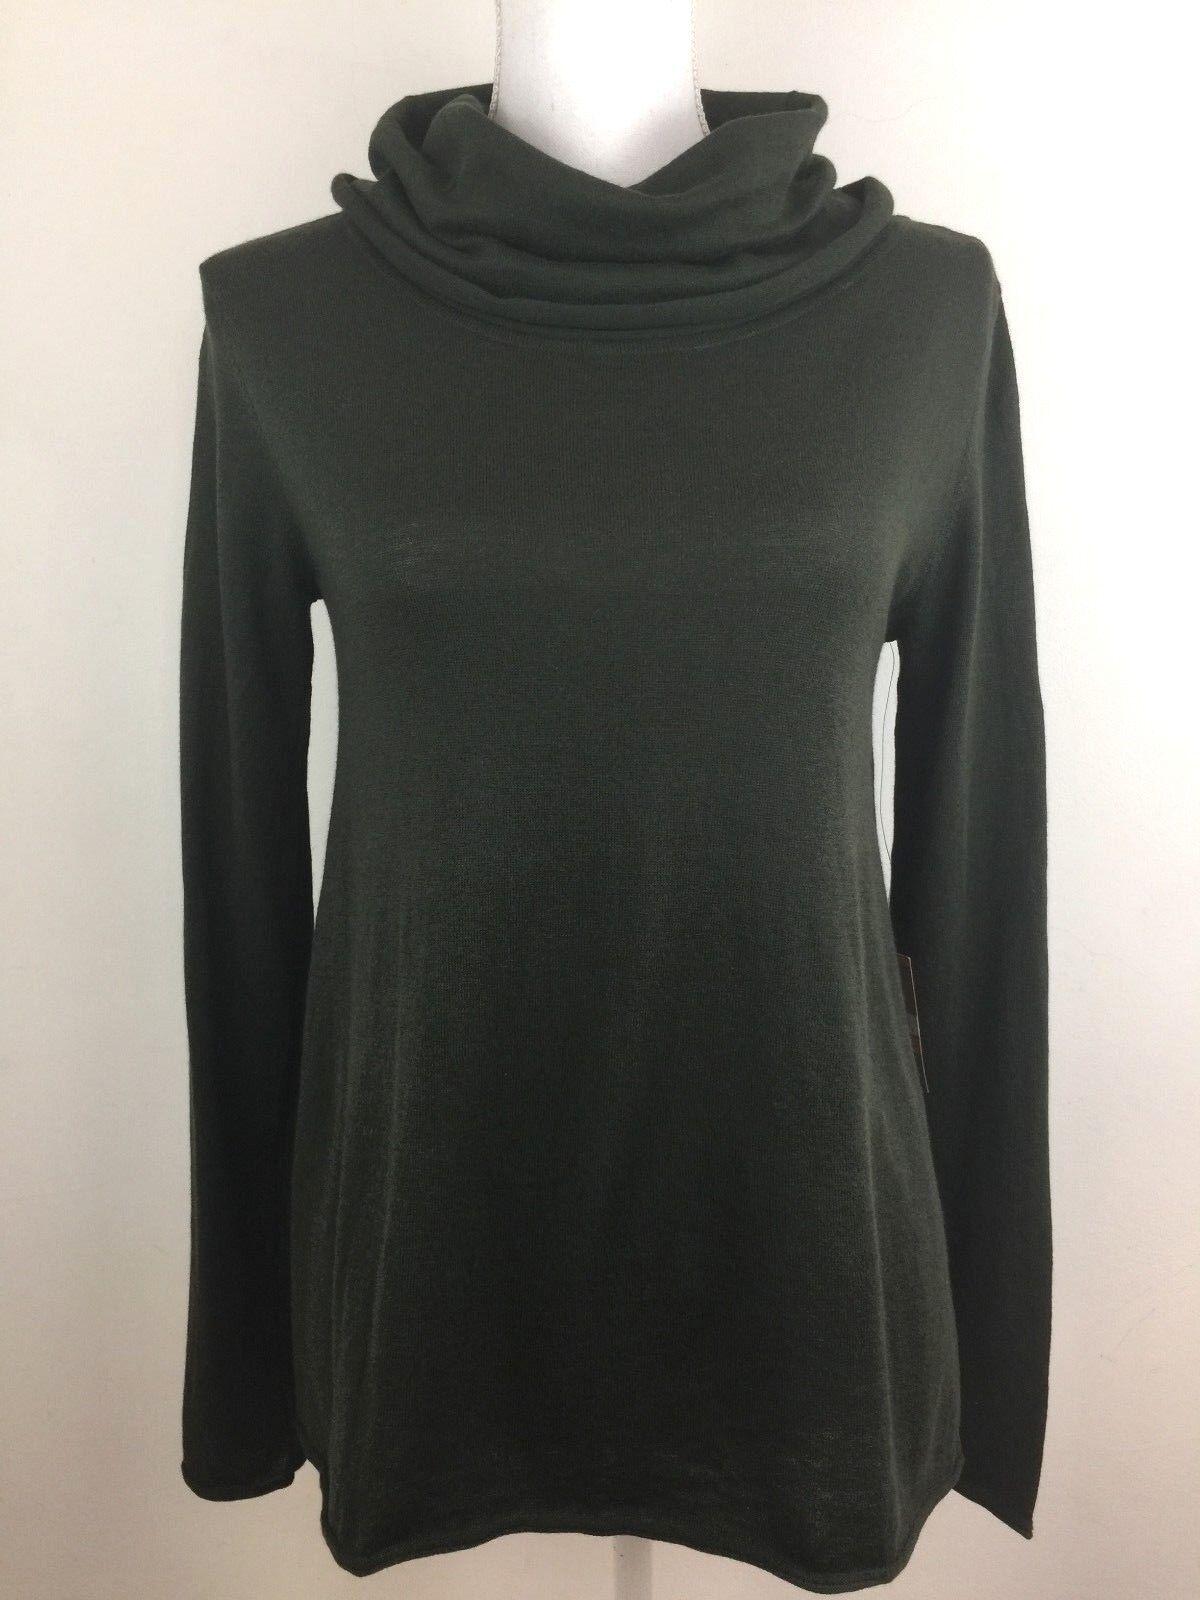 NWT RACHL by Rachel Roy Green Women's Sweater Size S